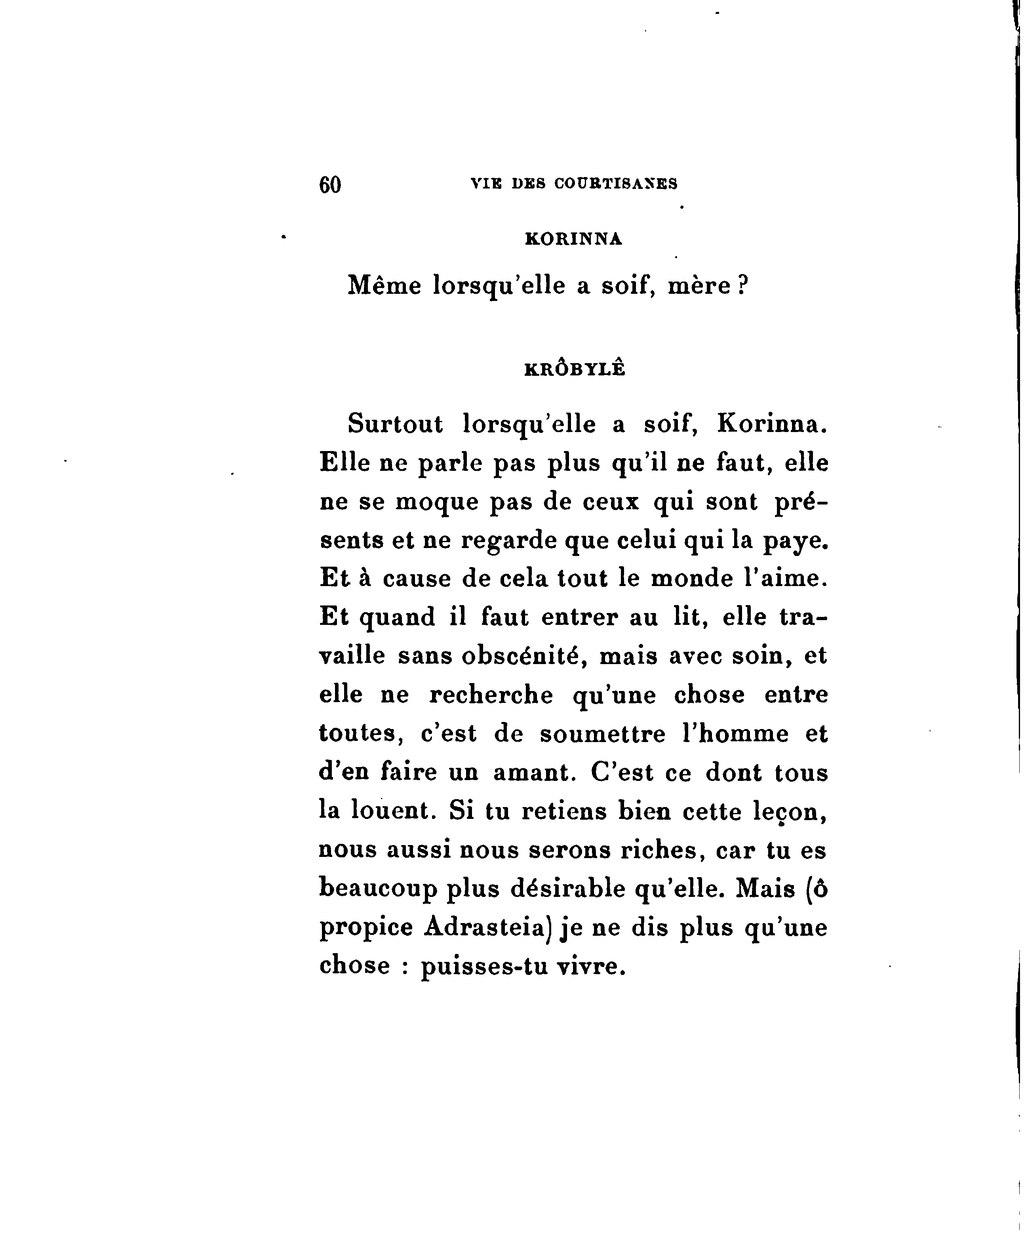 Page Lucien Scenes De La Vie Des Courtisanes 1894 Trad Louys